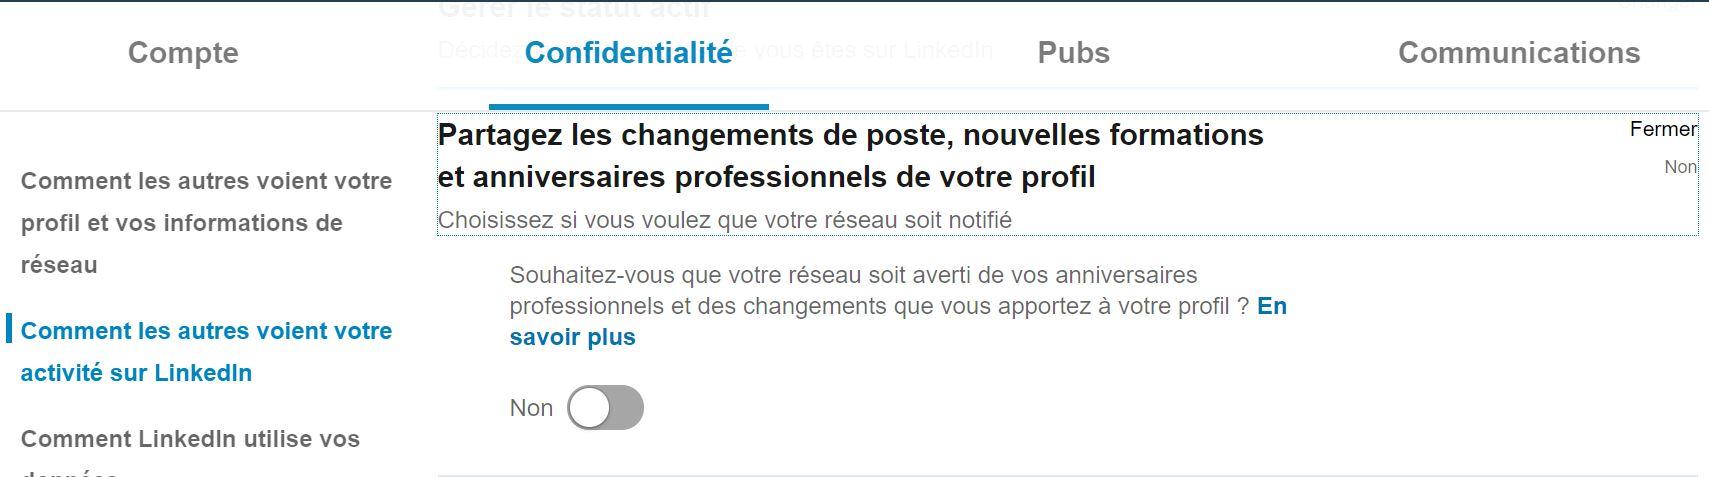 Utiliser LinkedIn : désactiver les notifications